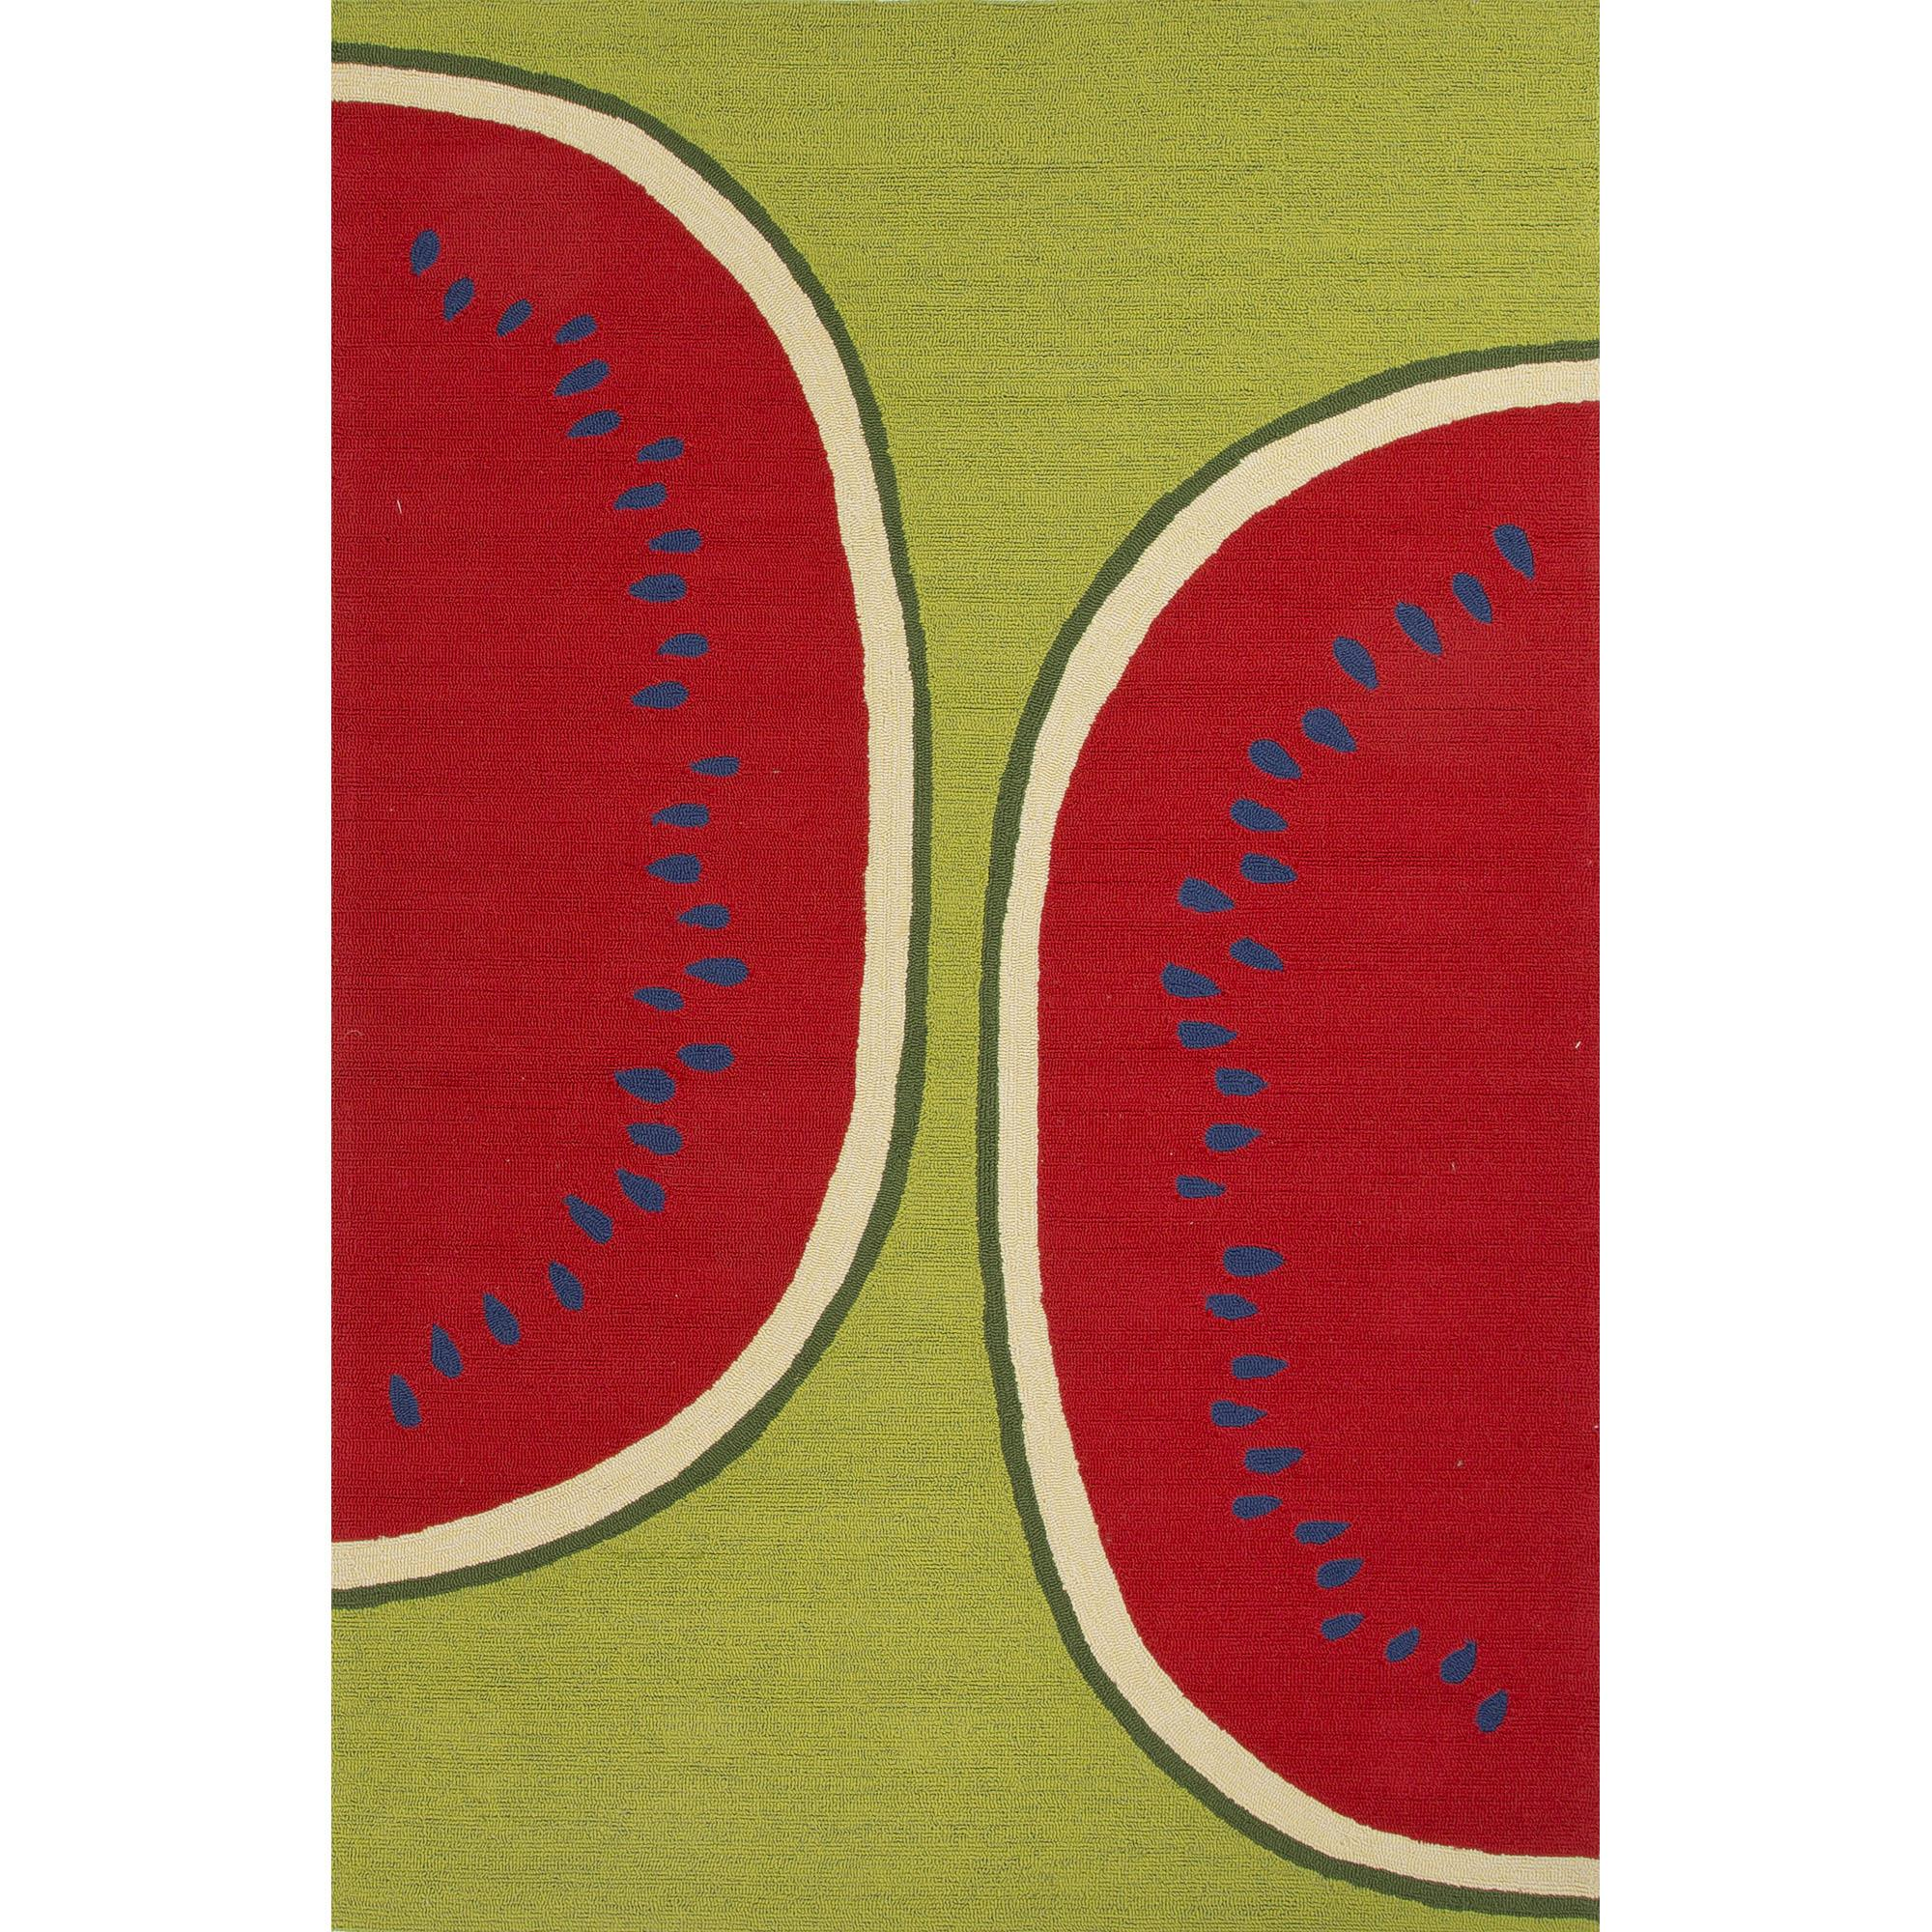 JAIPUR Rugs Grant I-o 7.6 x 9.6 Rug - Item Number: RUG116464